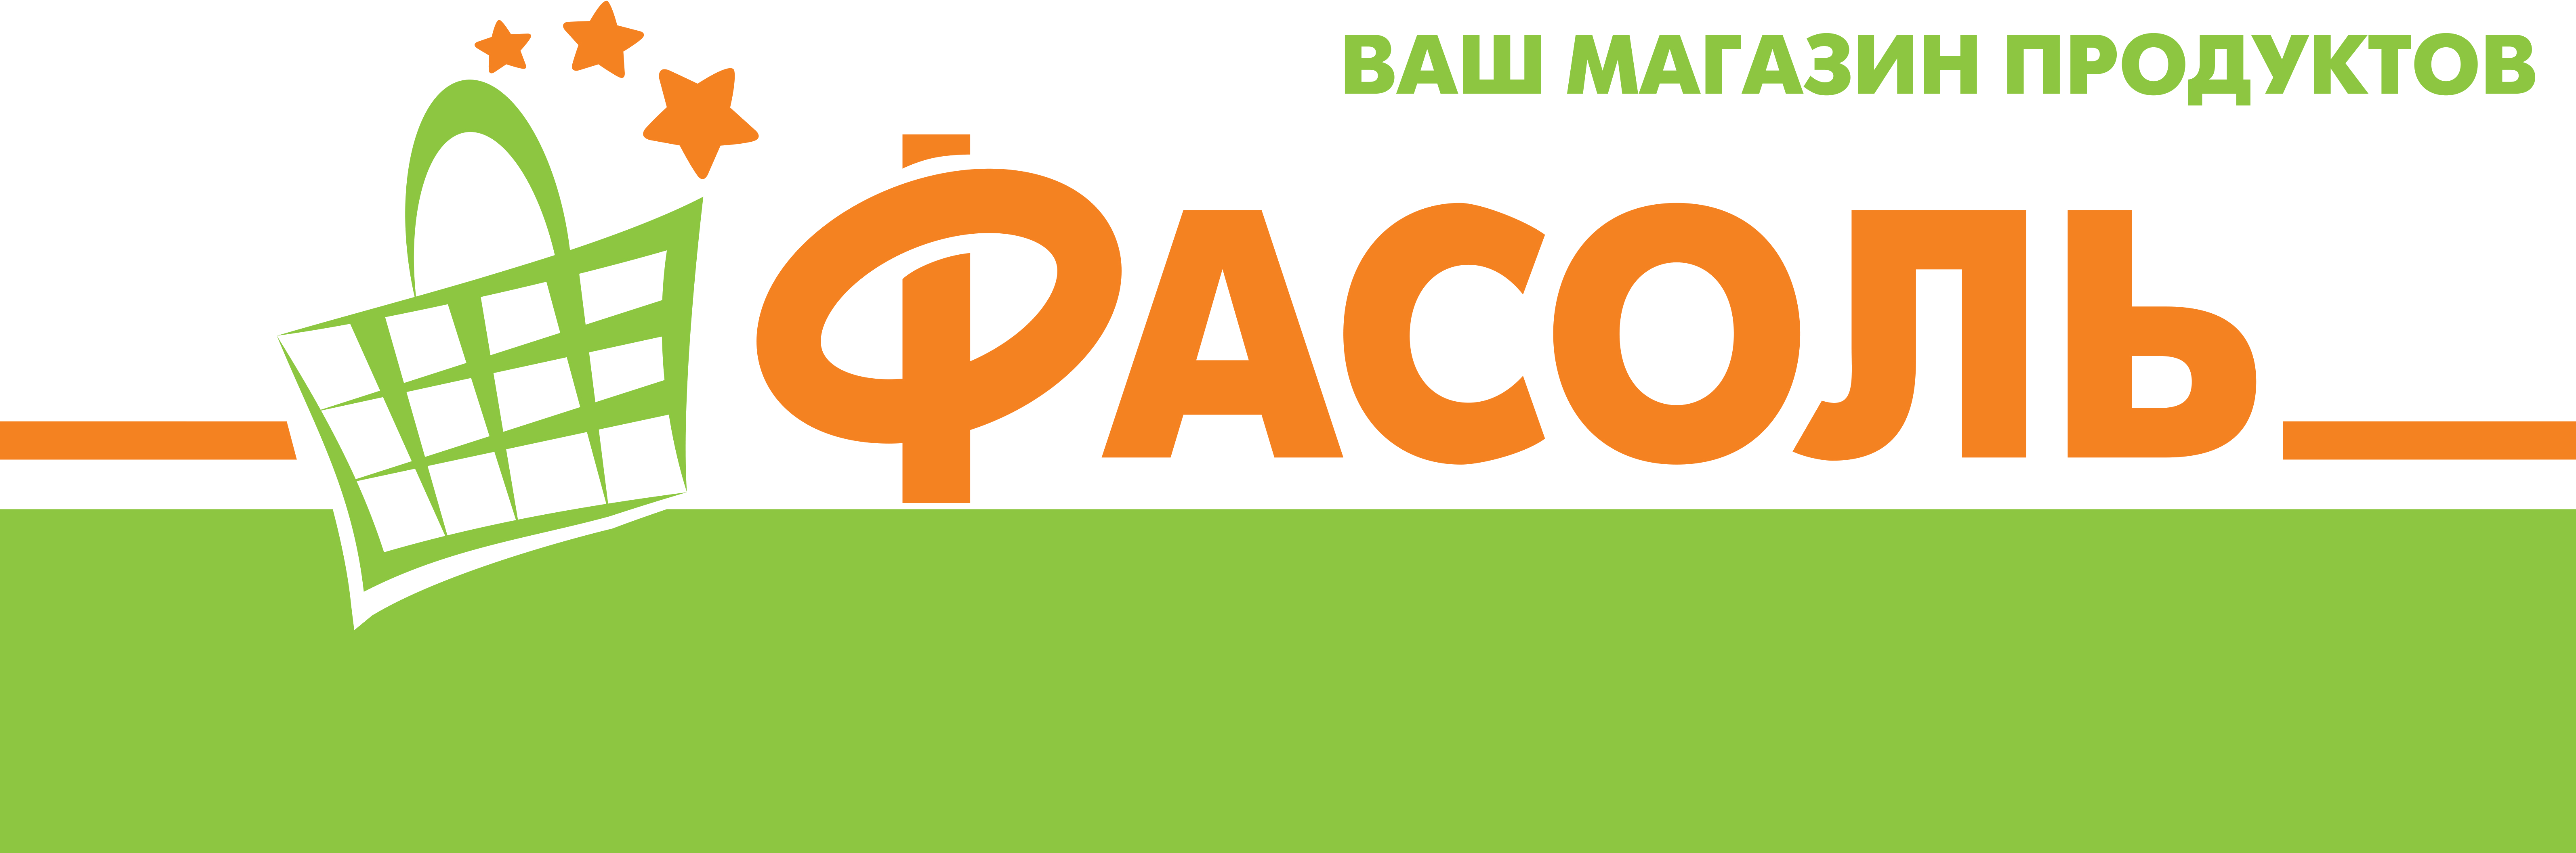 Fasol_1-1